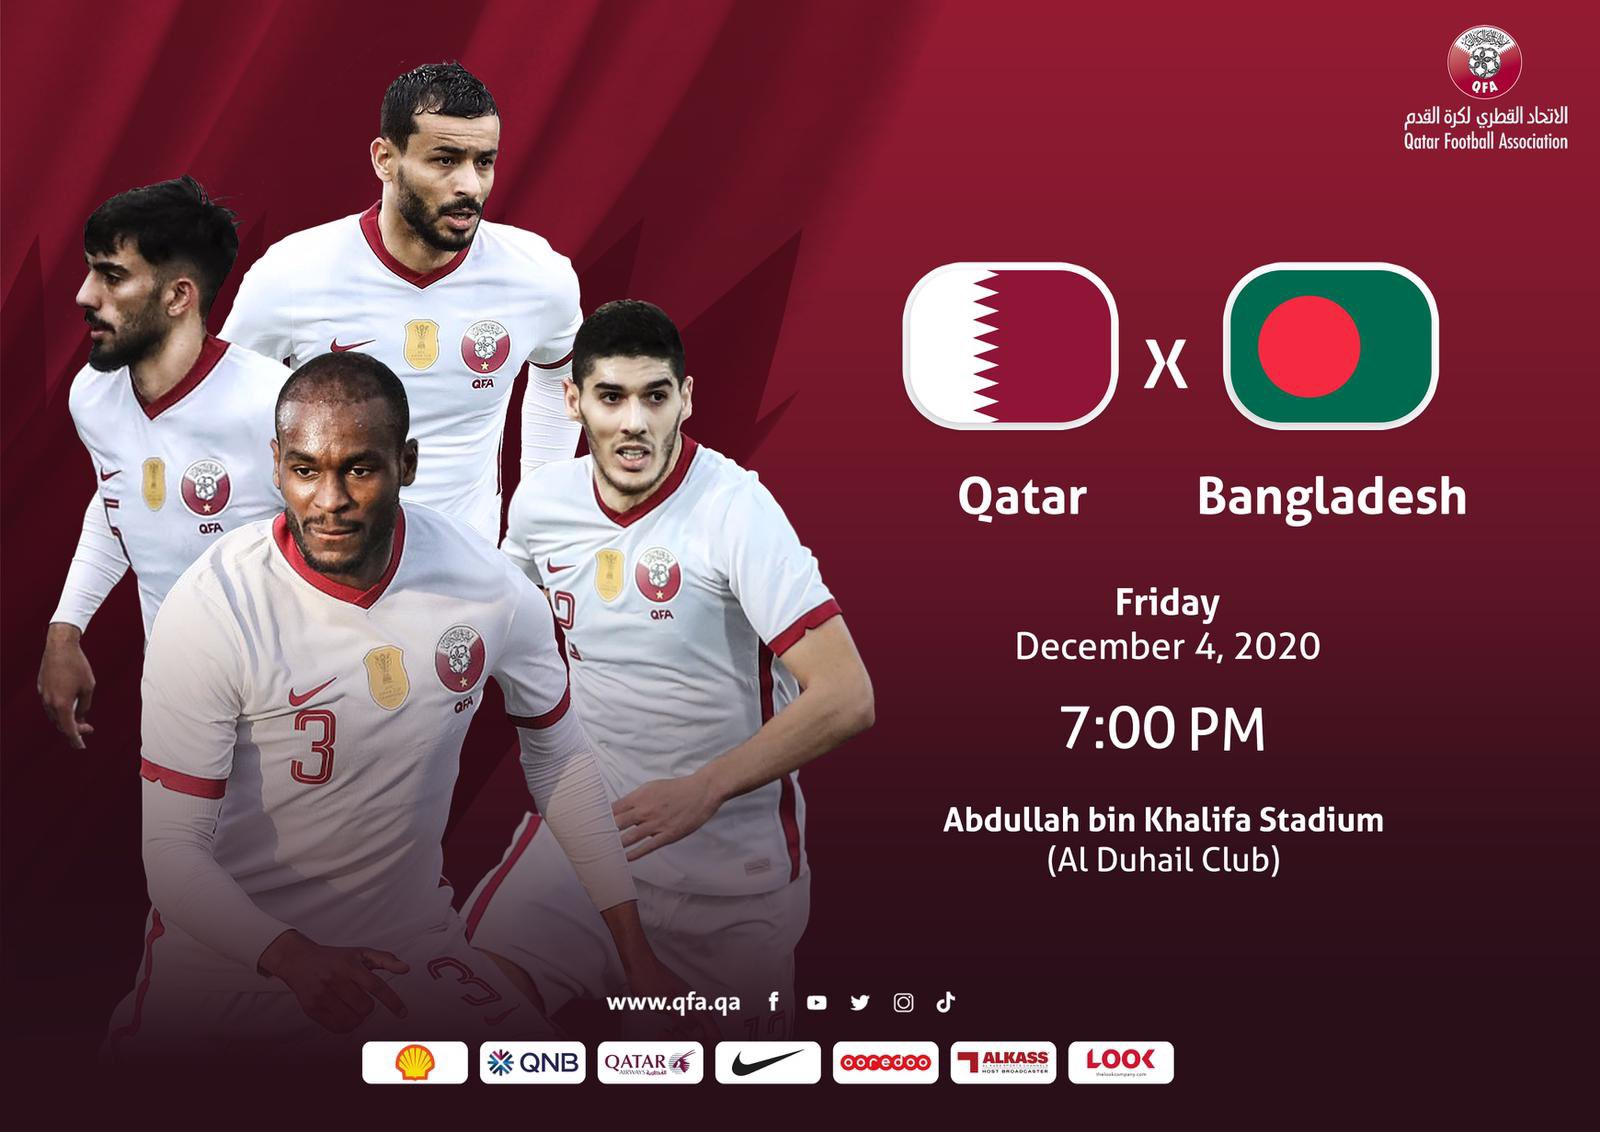 Qatar Football Association on Twitter